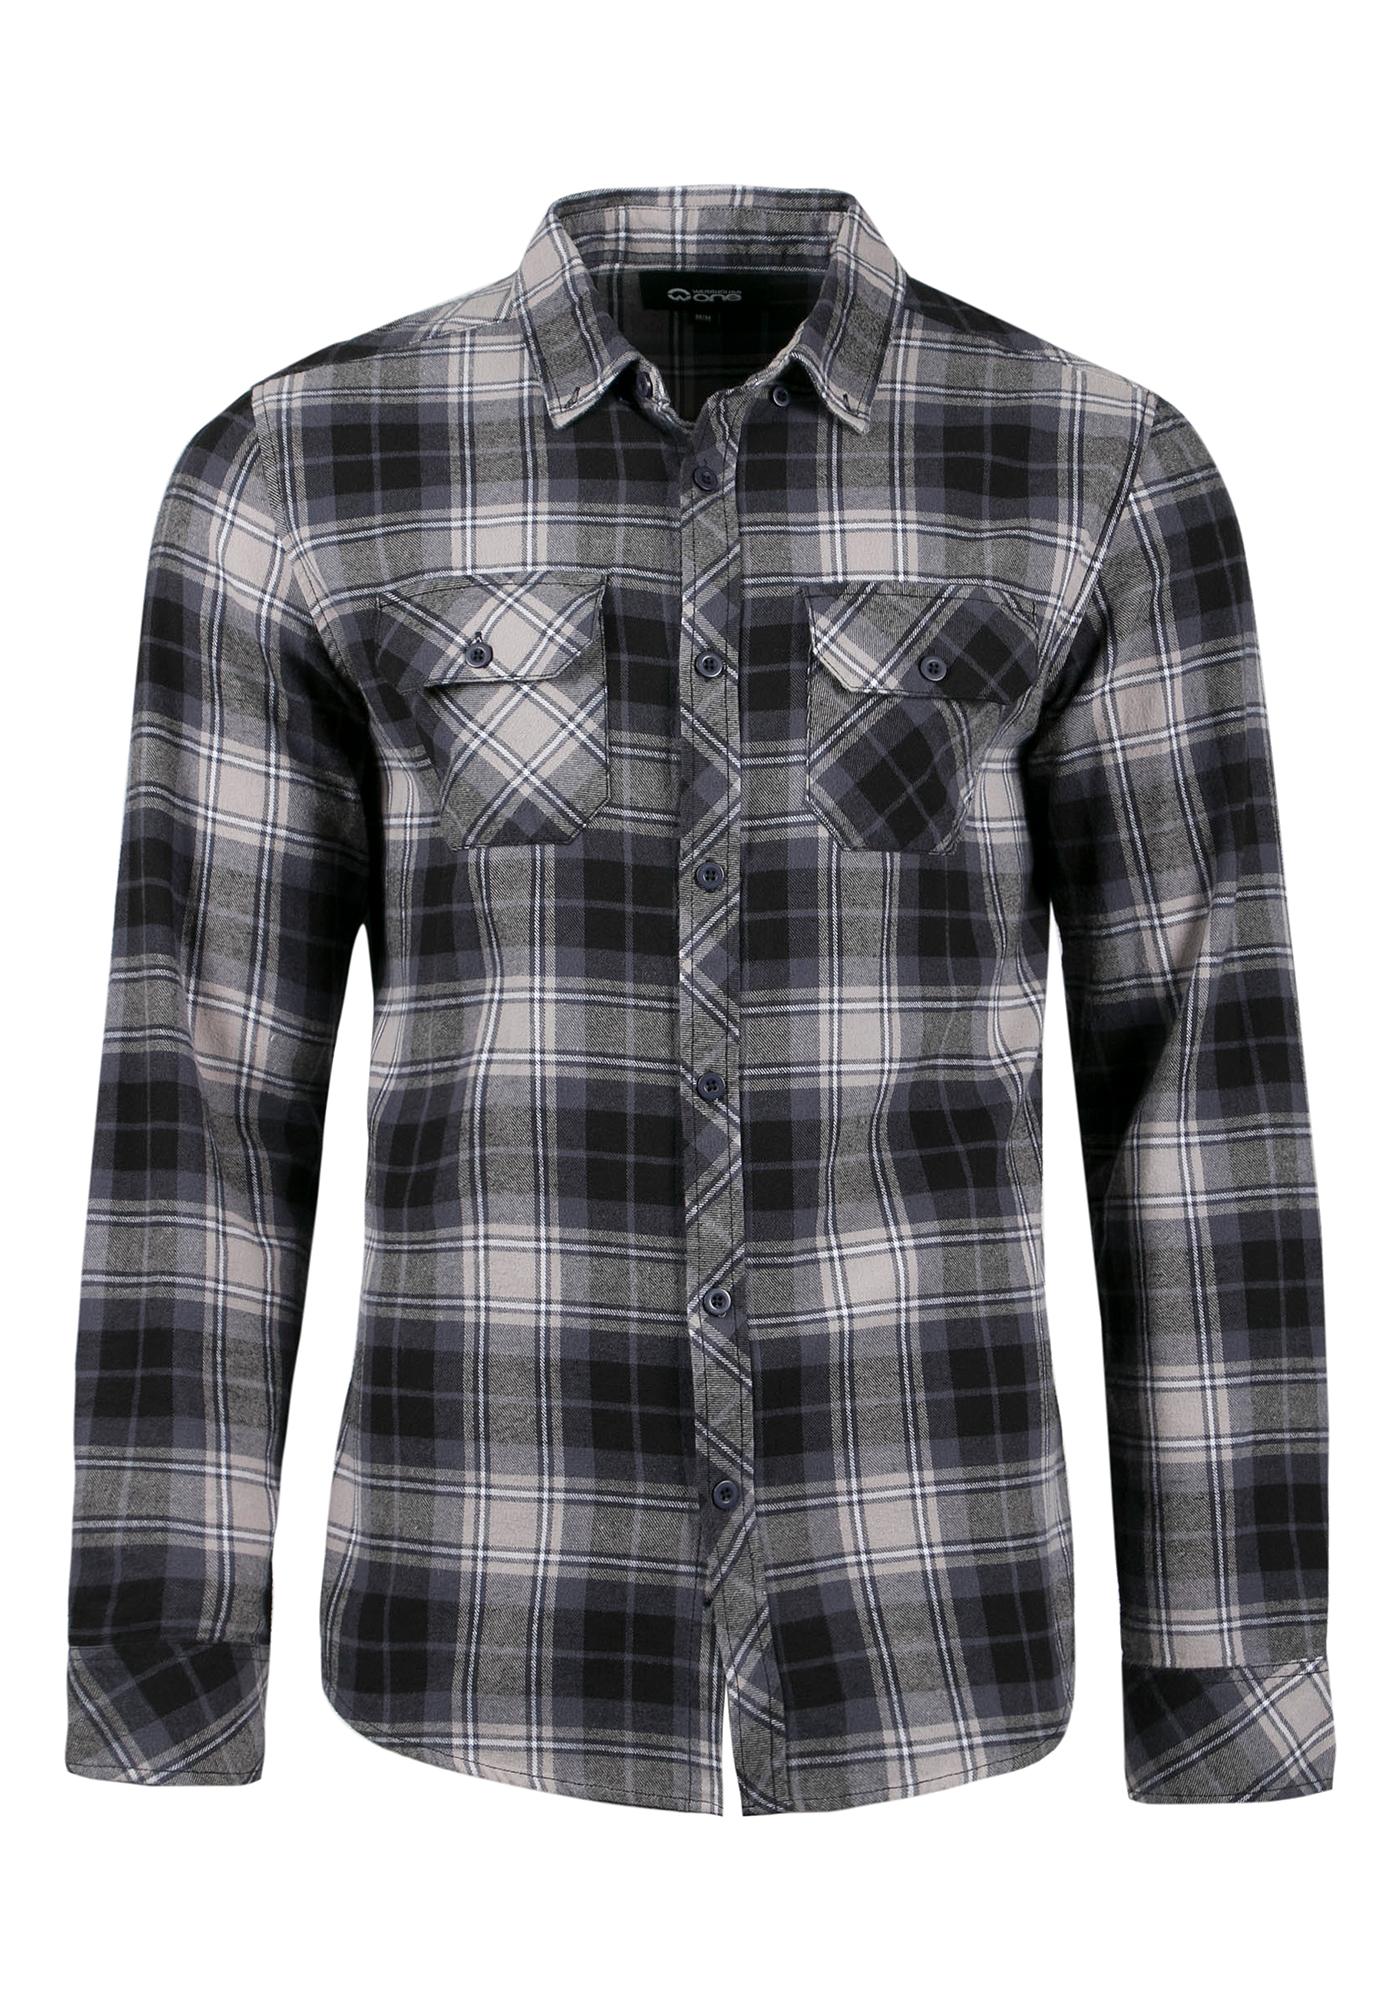 Denim Shirt For Mens